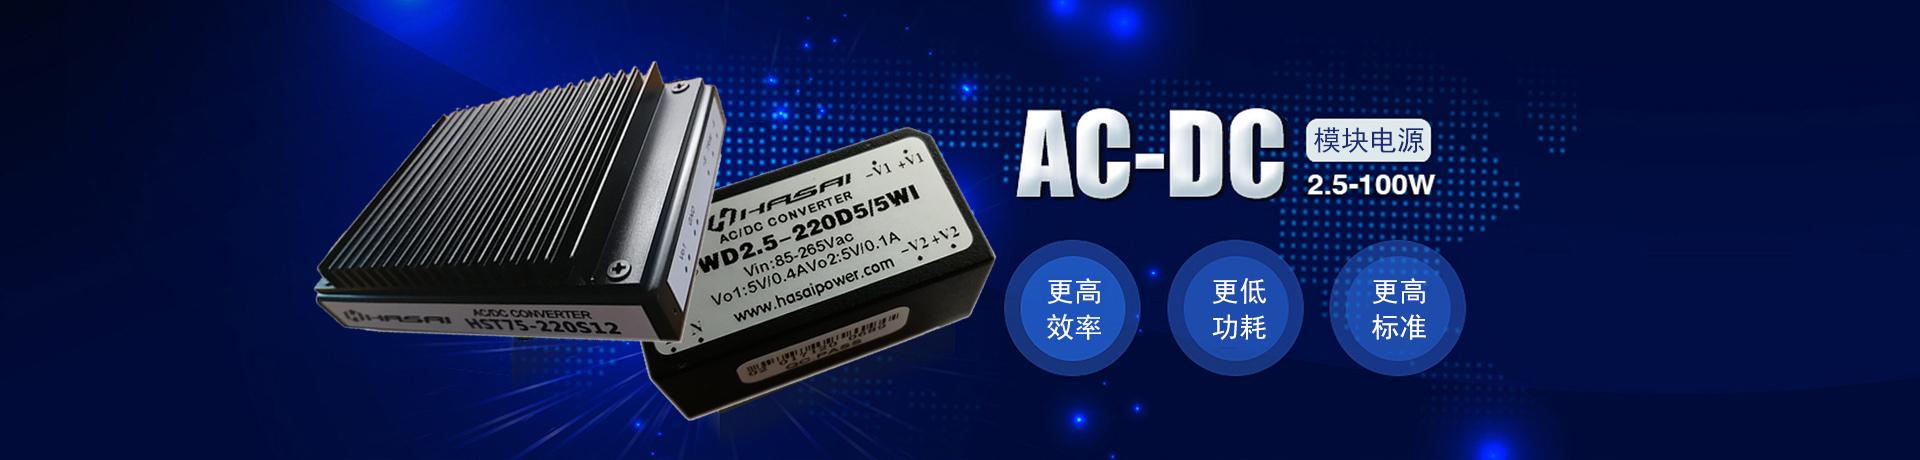 ACDC模块电源